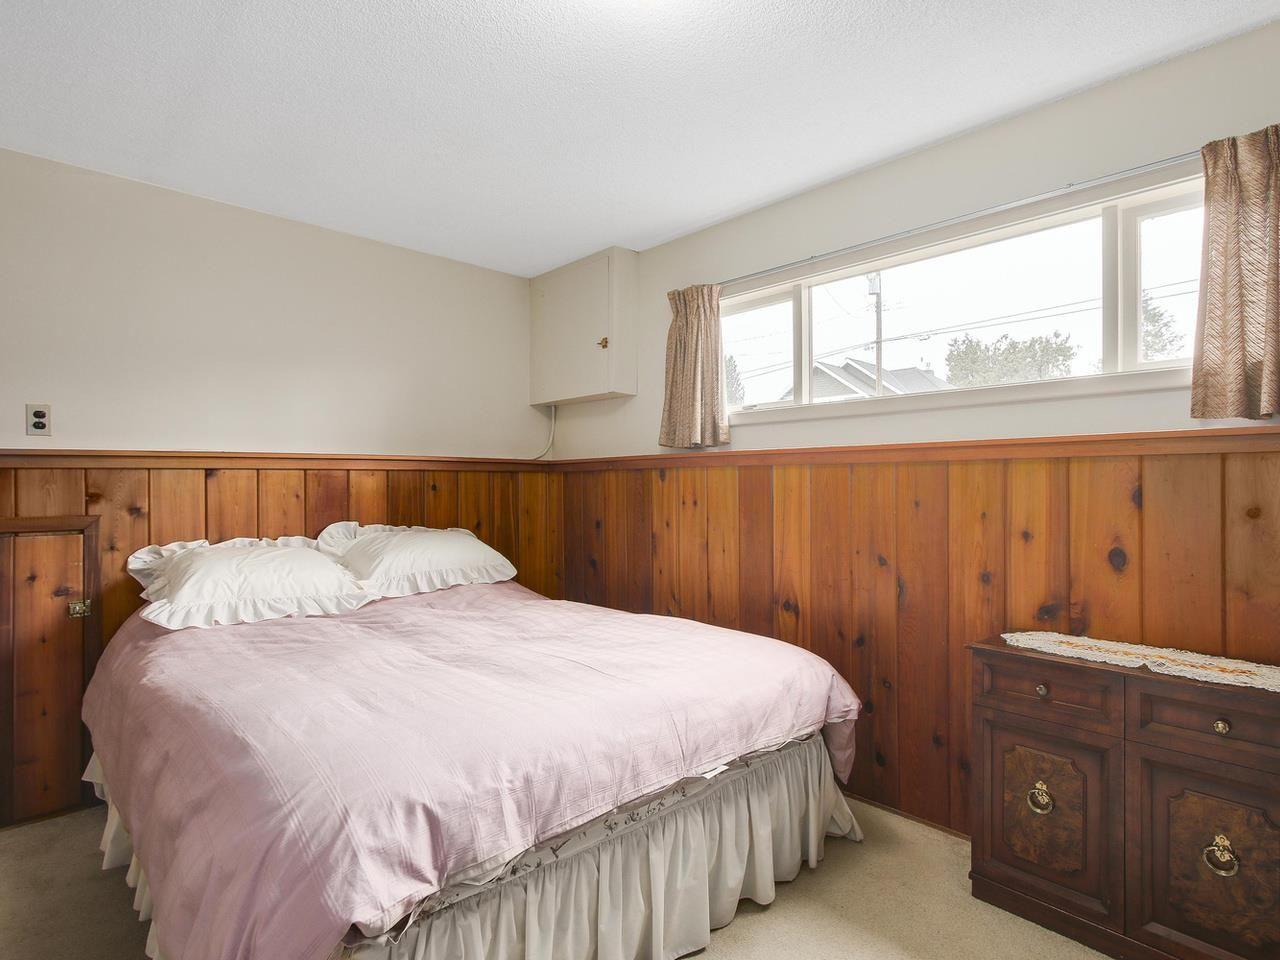 Photo 14: Photos: 1320 REGAN Avenue in Coquitlam: Central Coquitlam House for sale : MLS®# R2147096